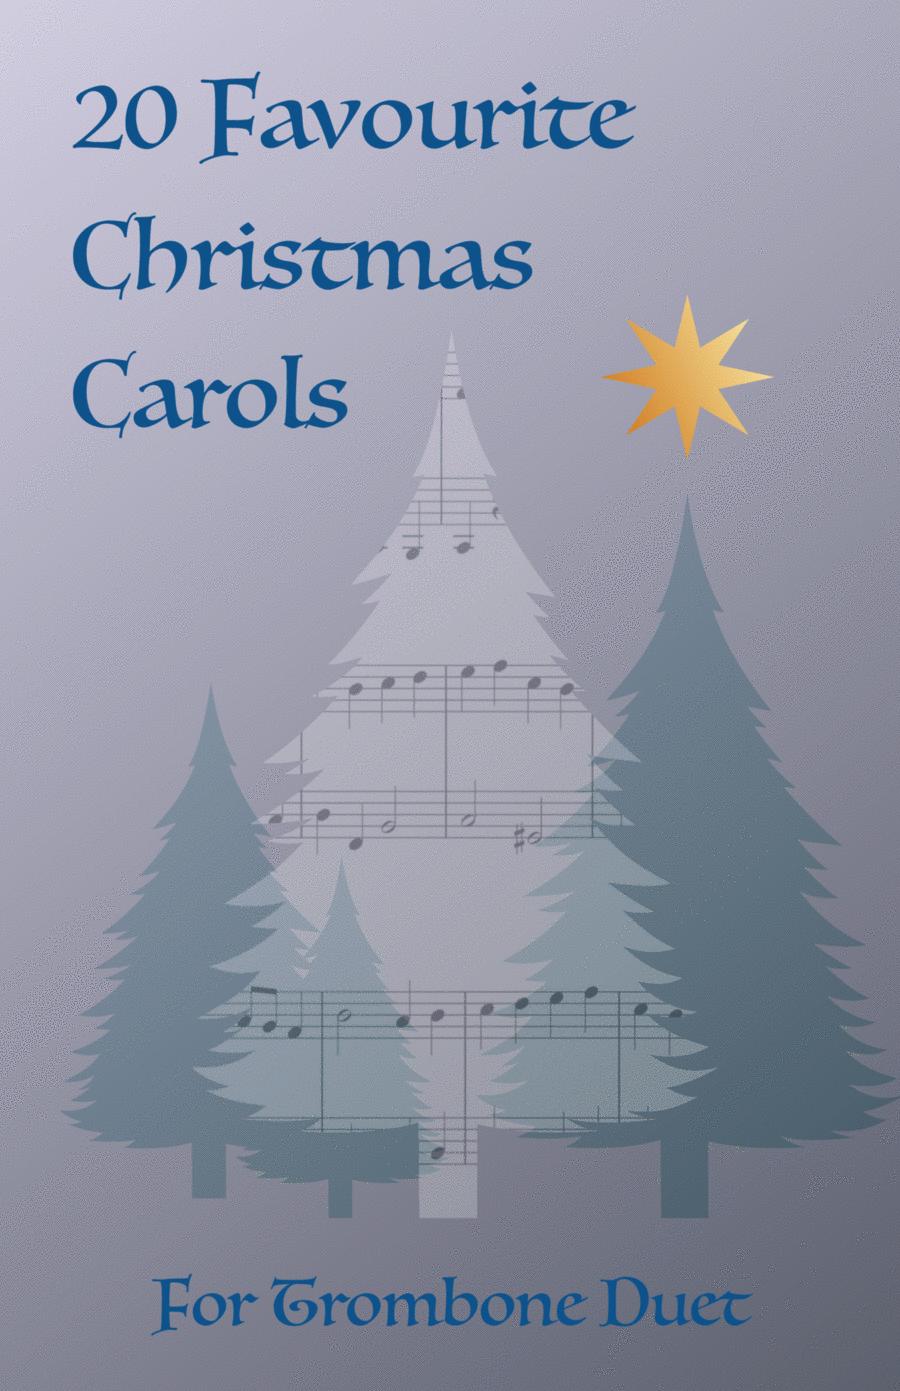 20 Favourite Christmas Carols for Trombone Duet